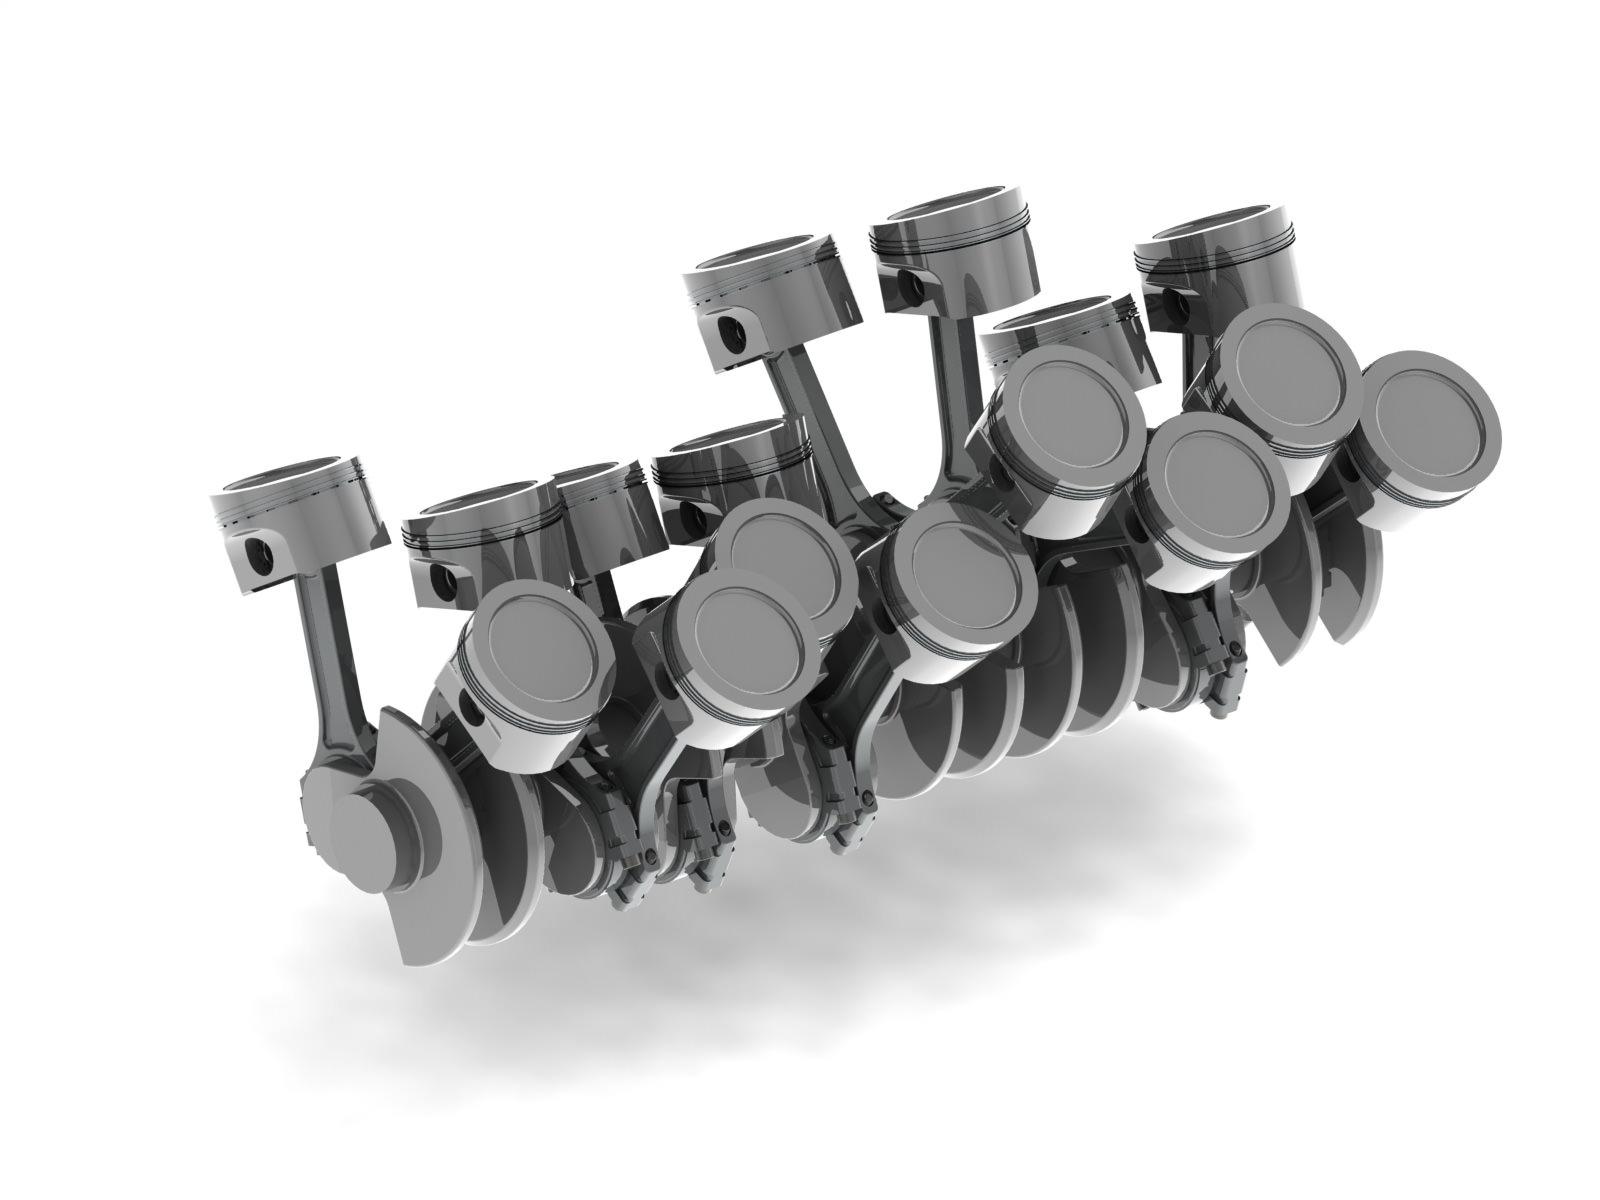 W16 engine cranktrain 3d model